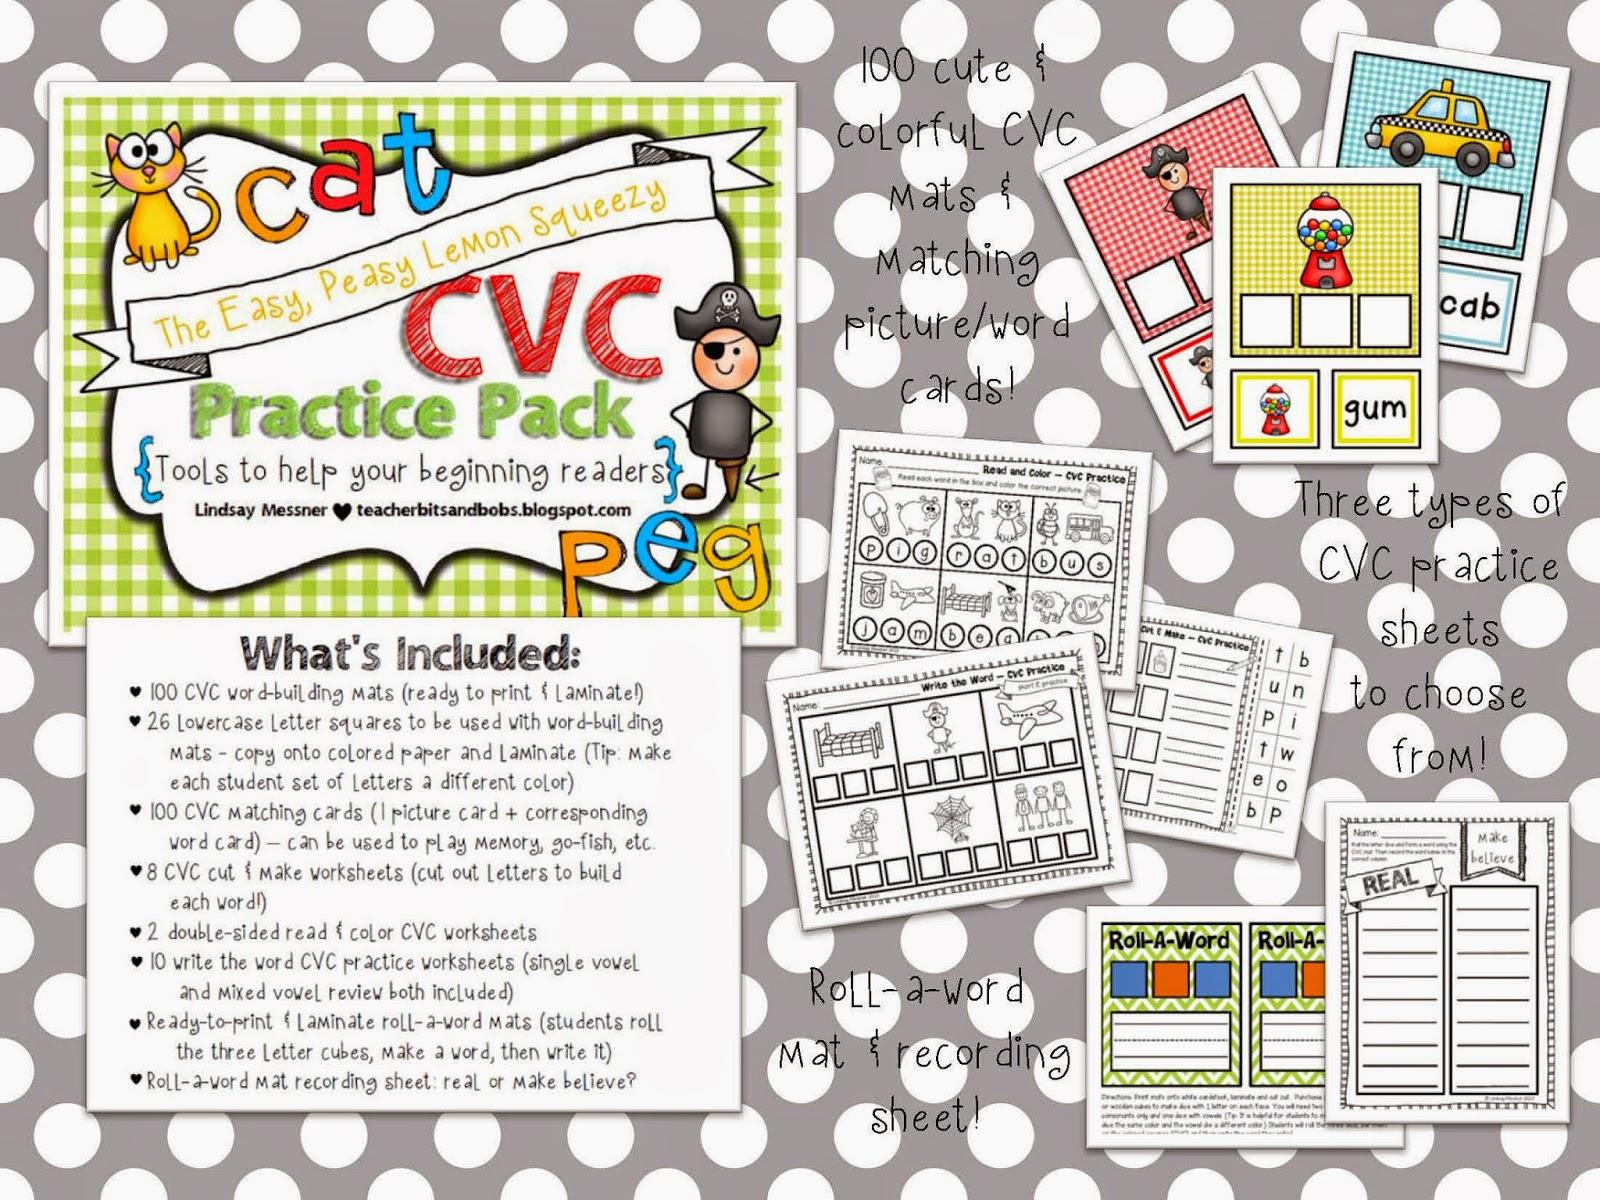 https://www.teacherspayteachers.com/Product/Easy-Peasy-Lemon-Squeezy-CVC-Practice-Pack-781876